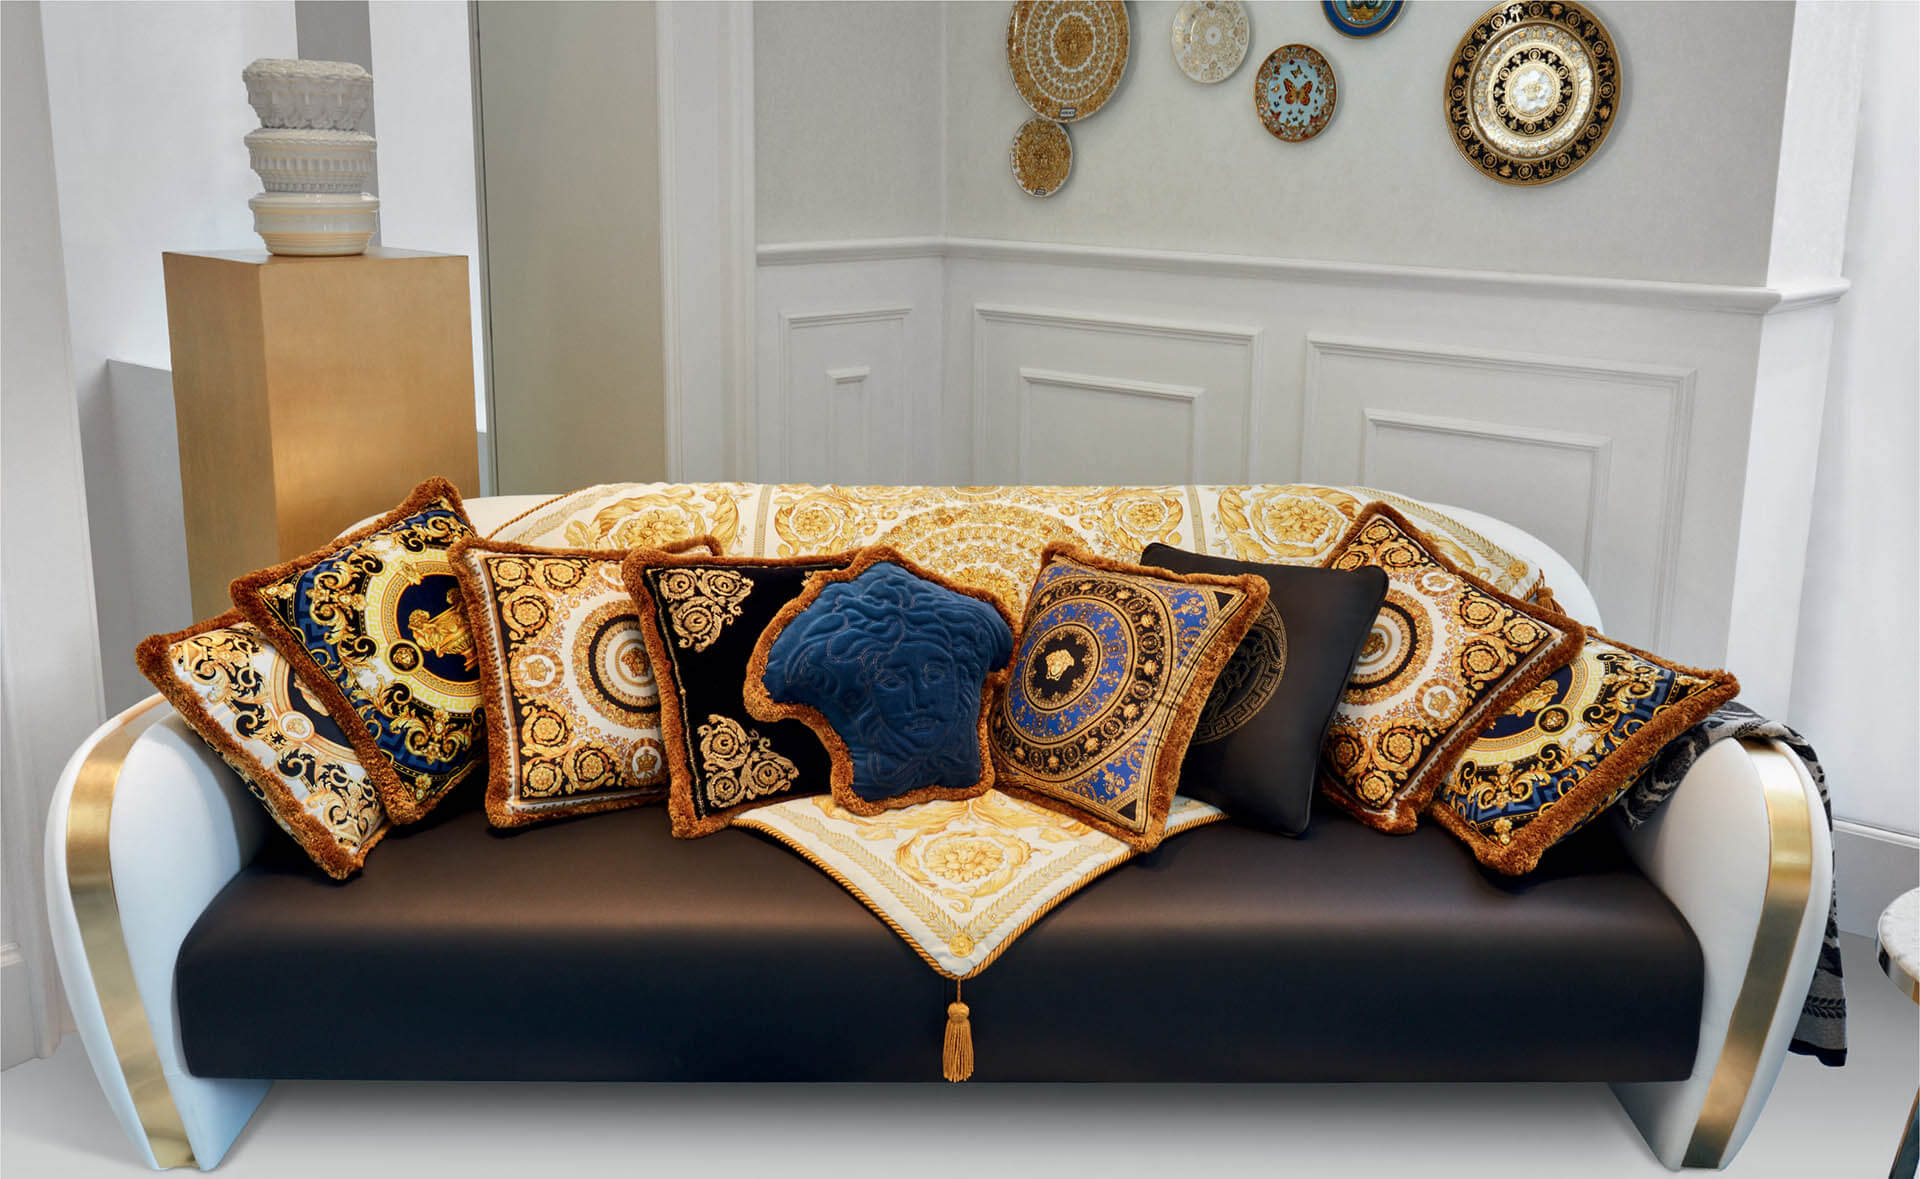 VERSACE HOME 奢侈品家具